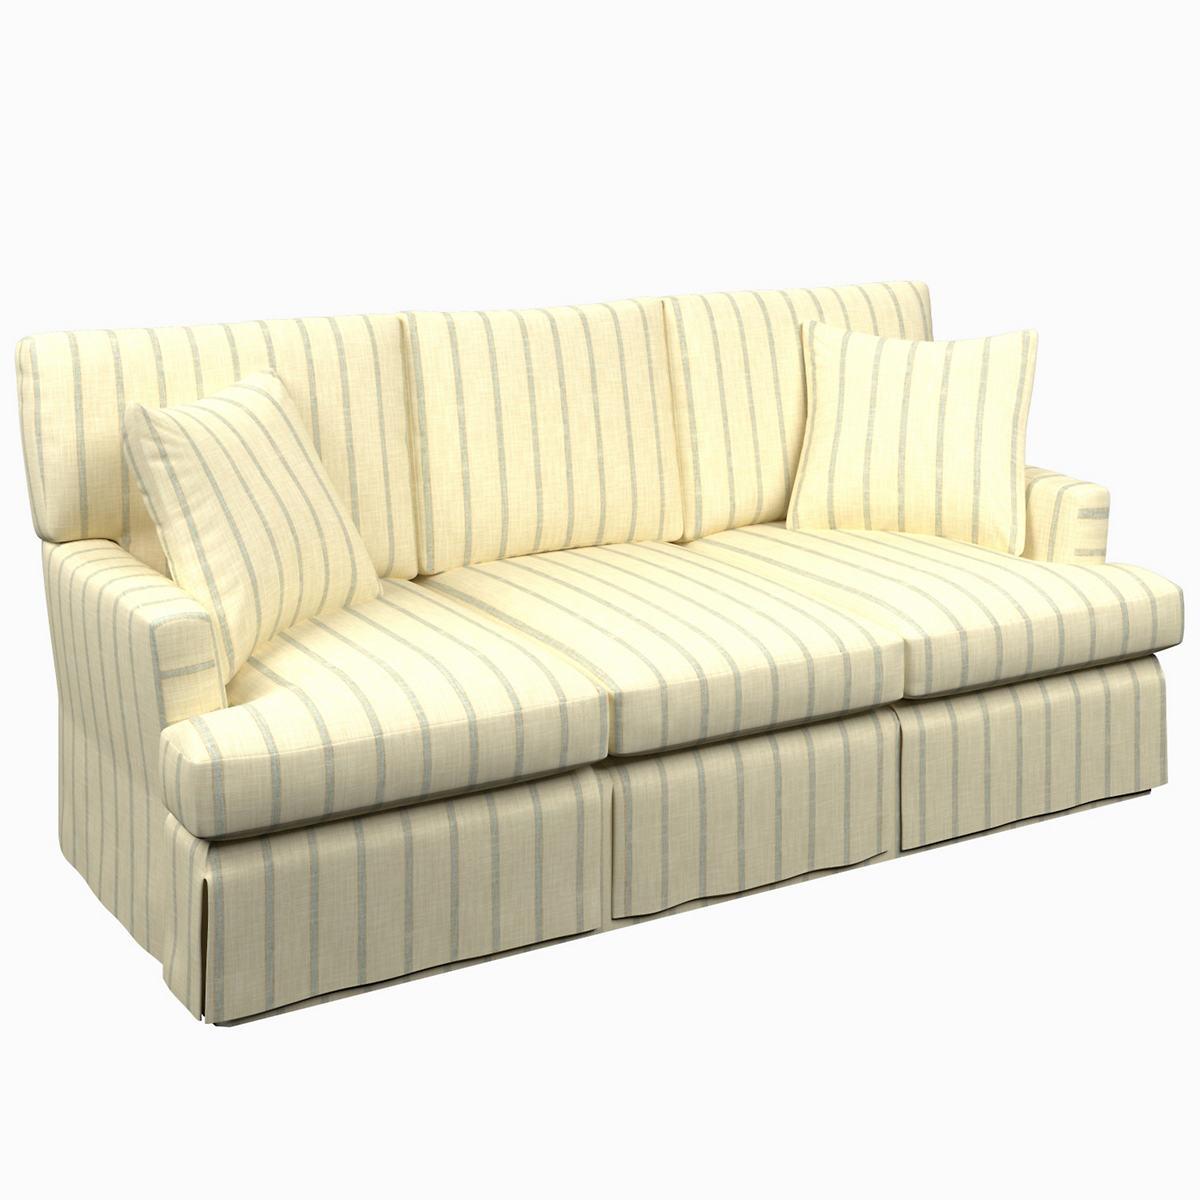 Glendale Stripe Light Blue/Natural Saybrook 3 Seater Slipcovered Sofa